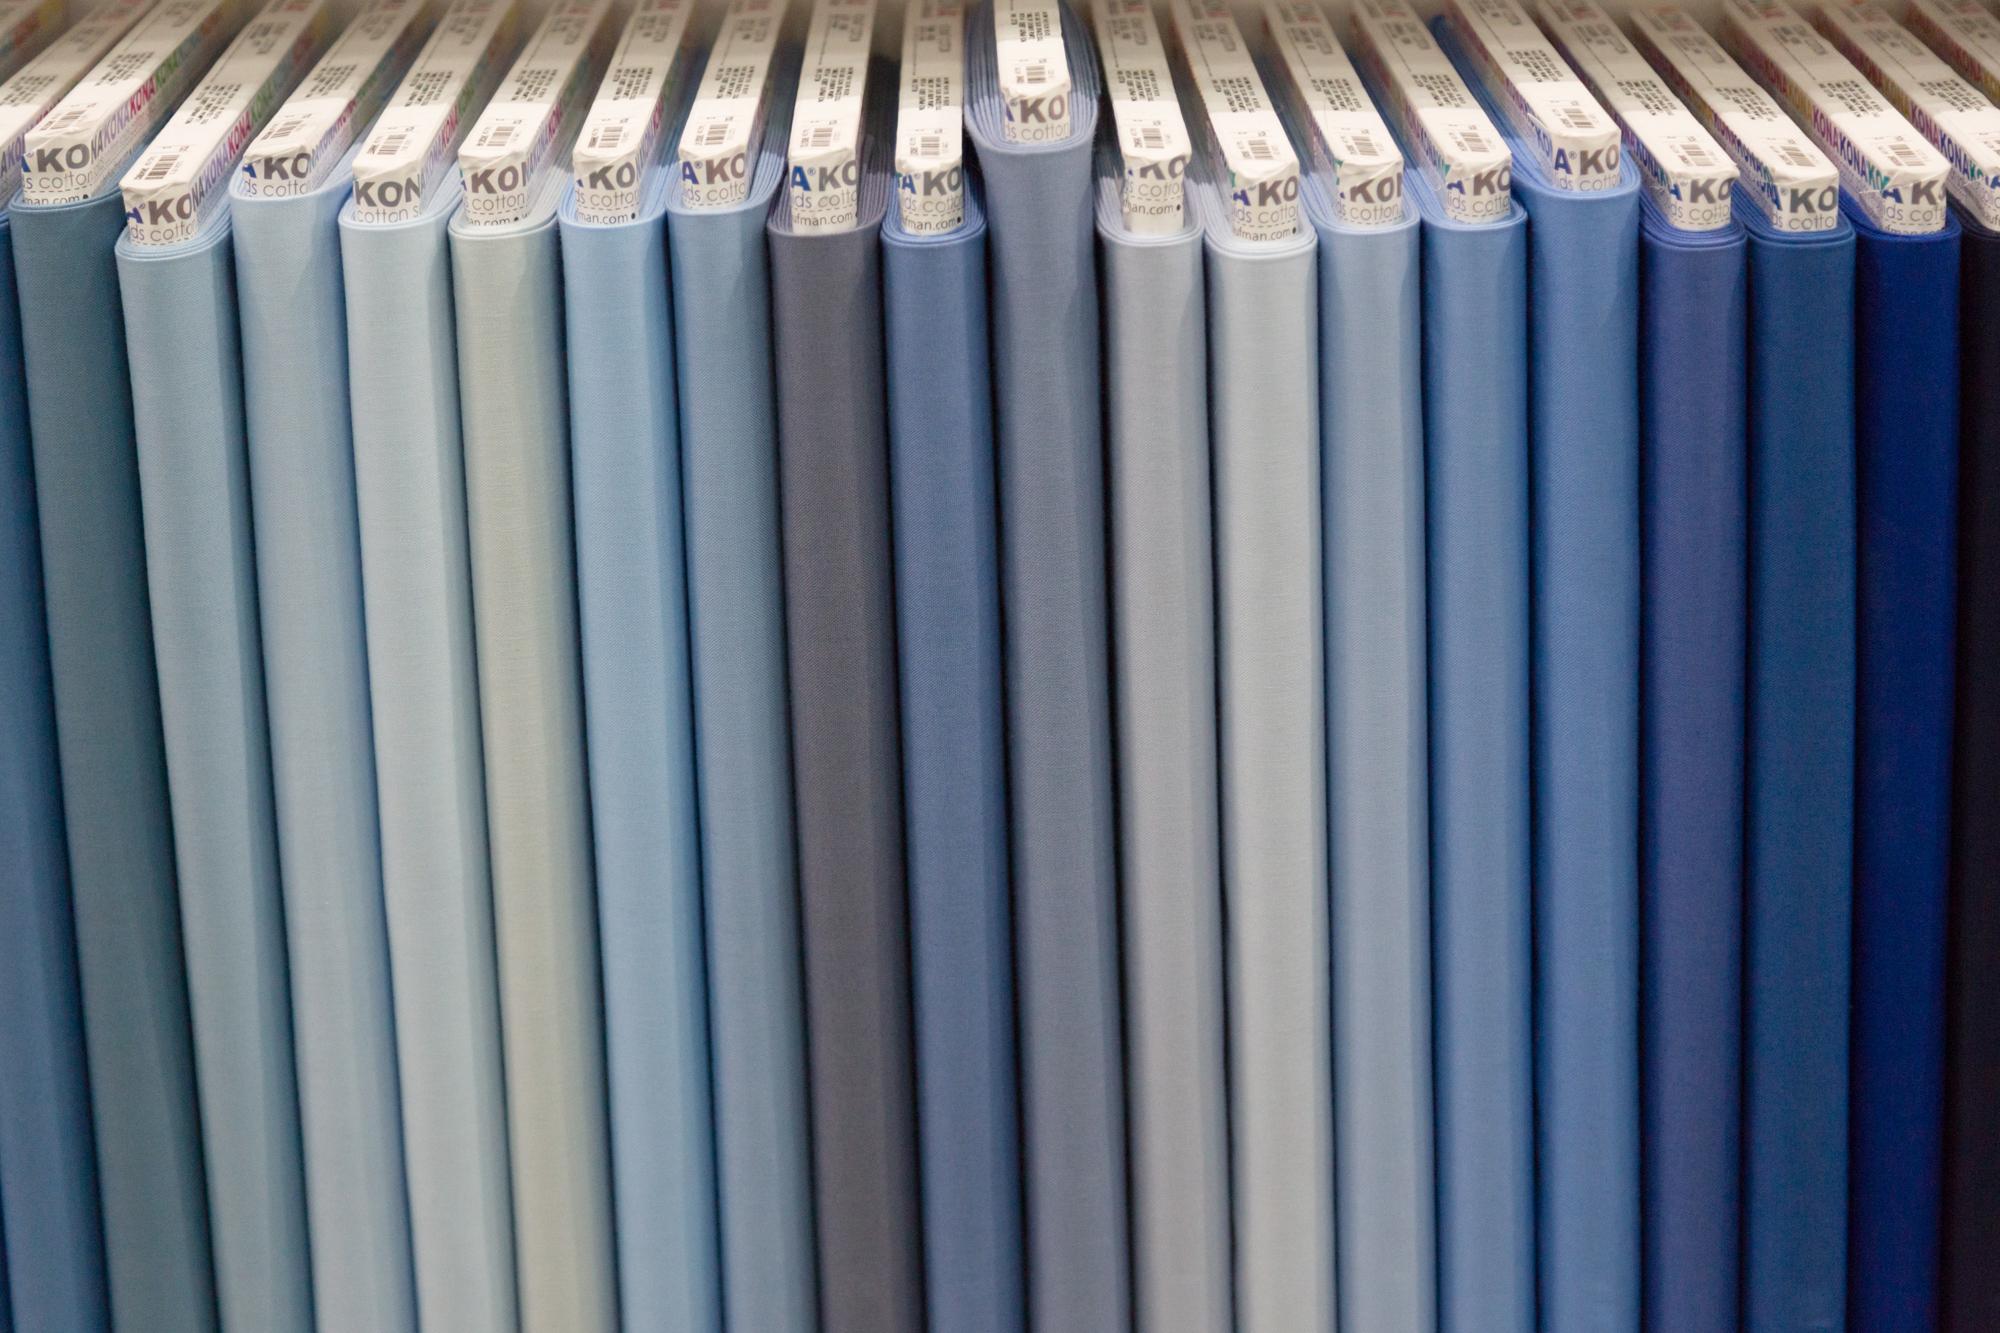 RK_QMfall17_Kona colors wall_07.jpg